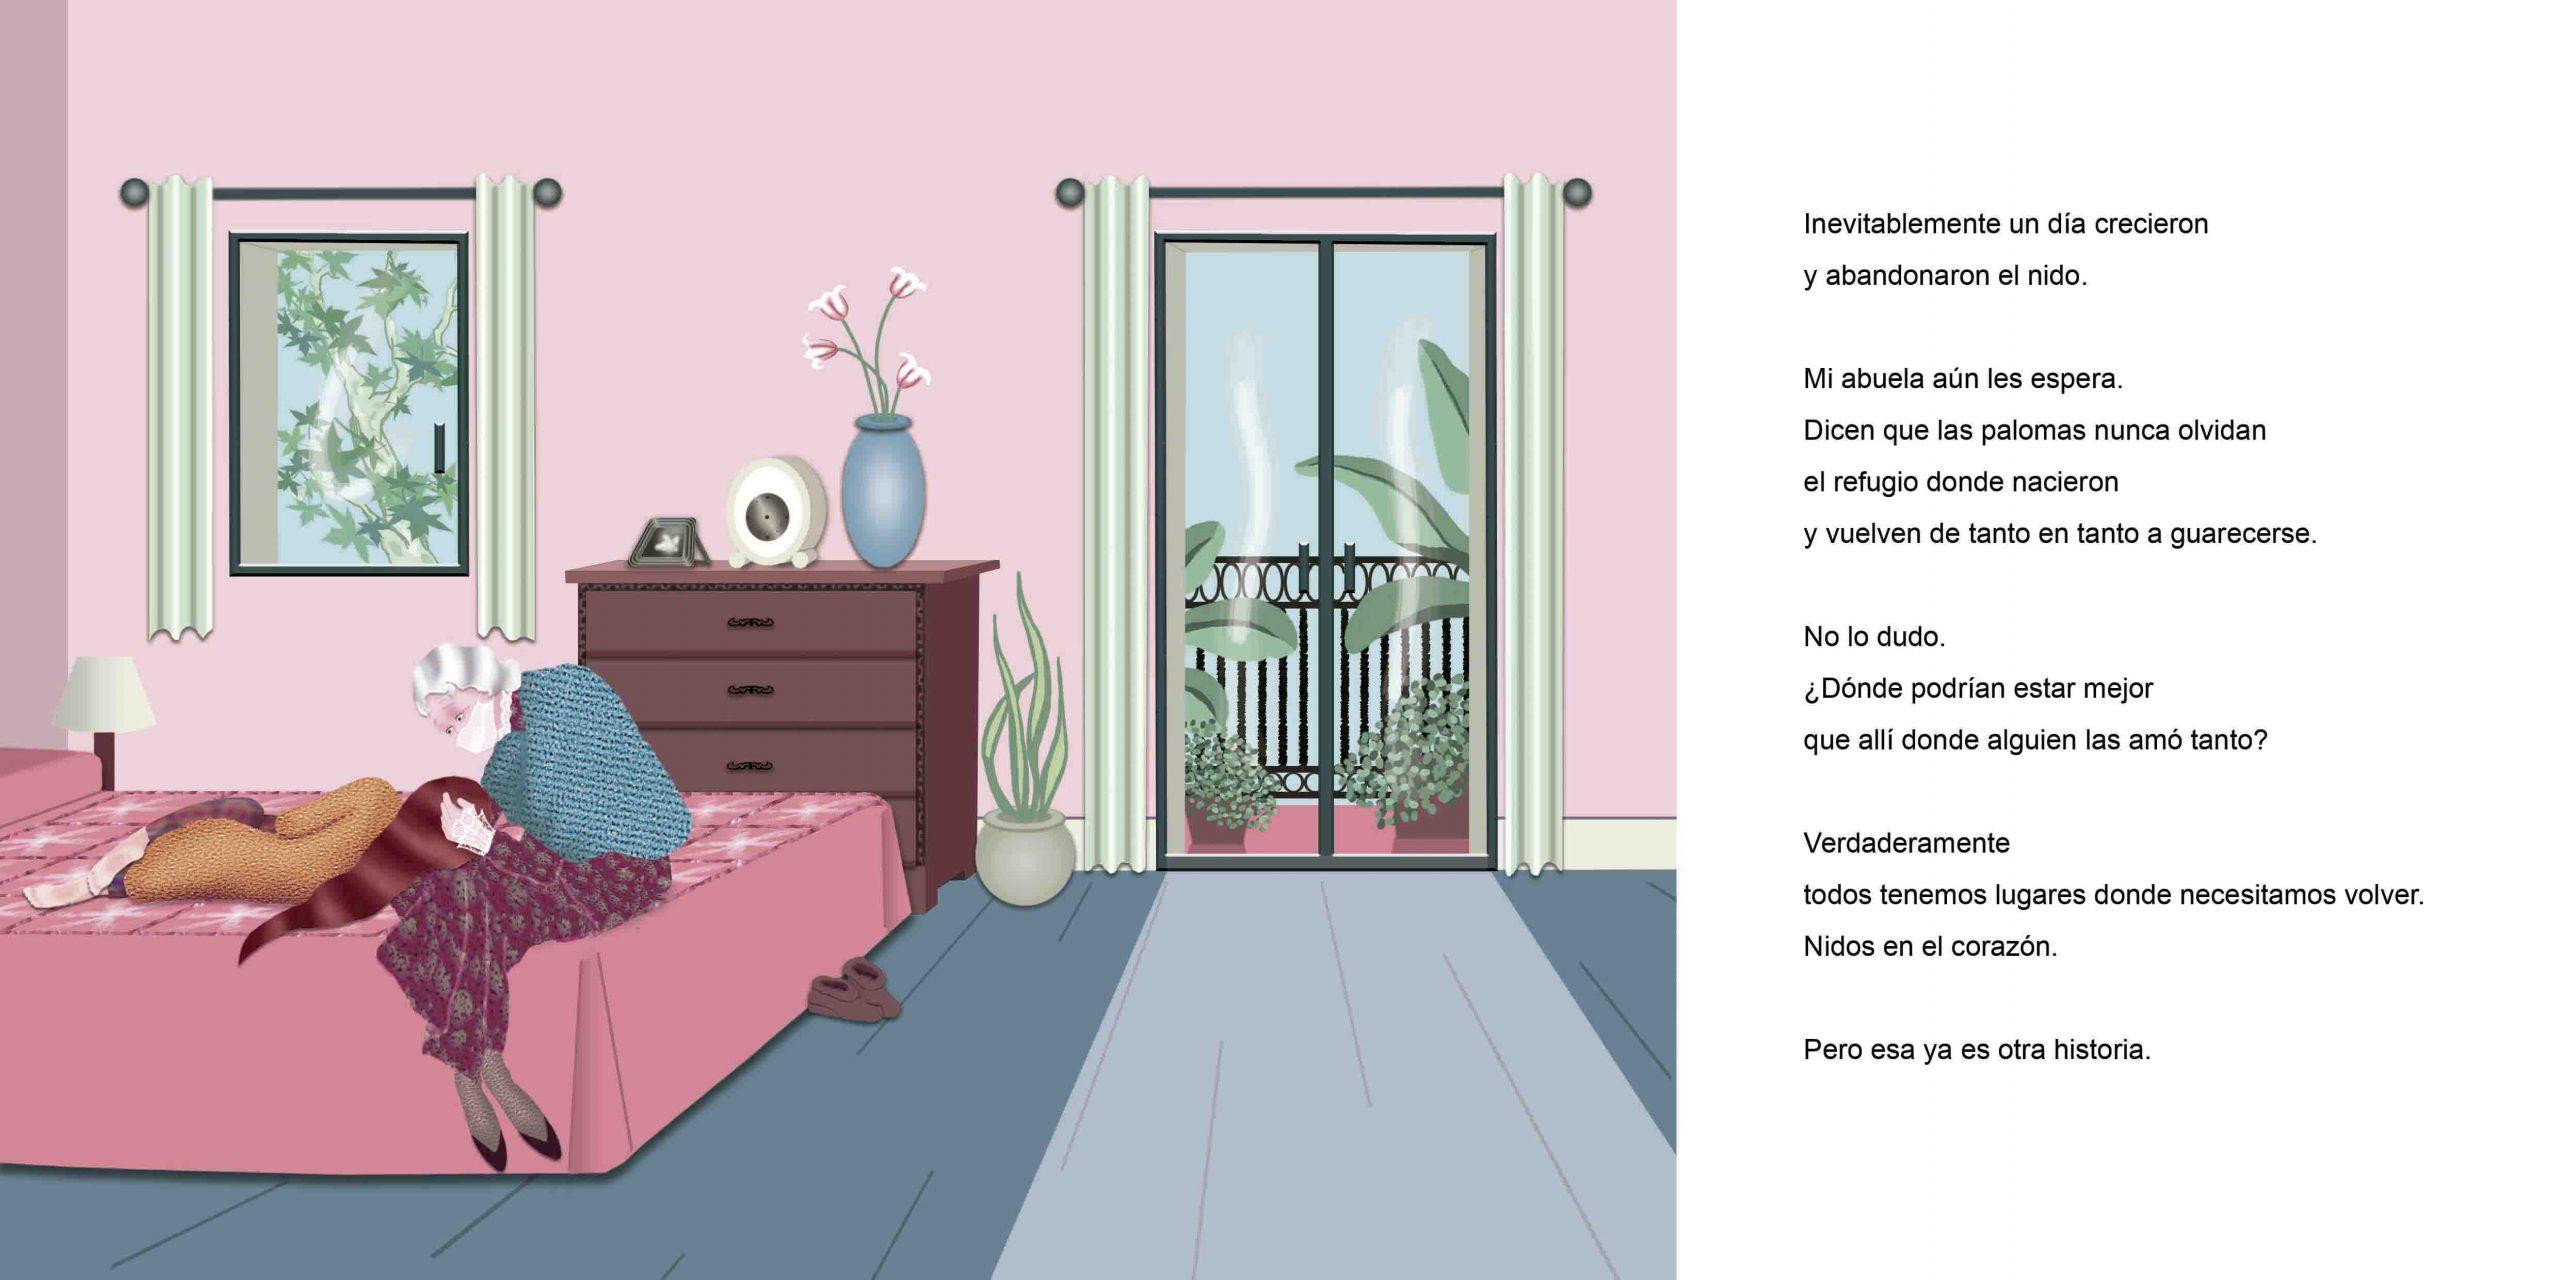 La Paloma Illustrated Album by Vivian Leila Campillo 28_29